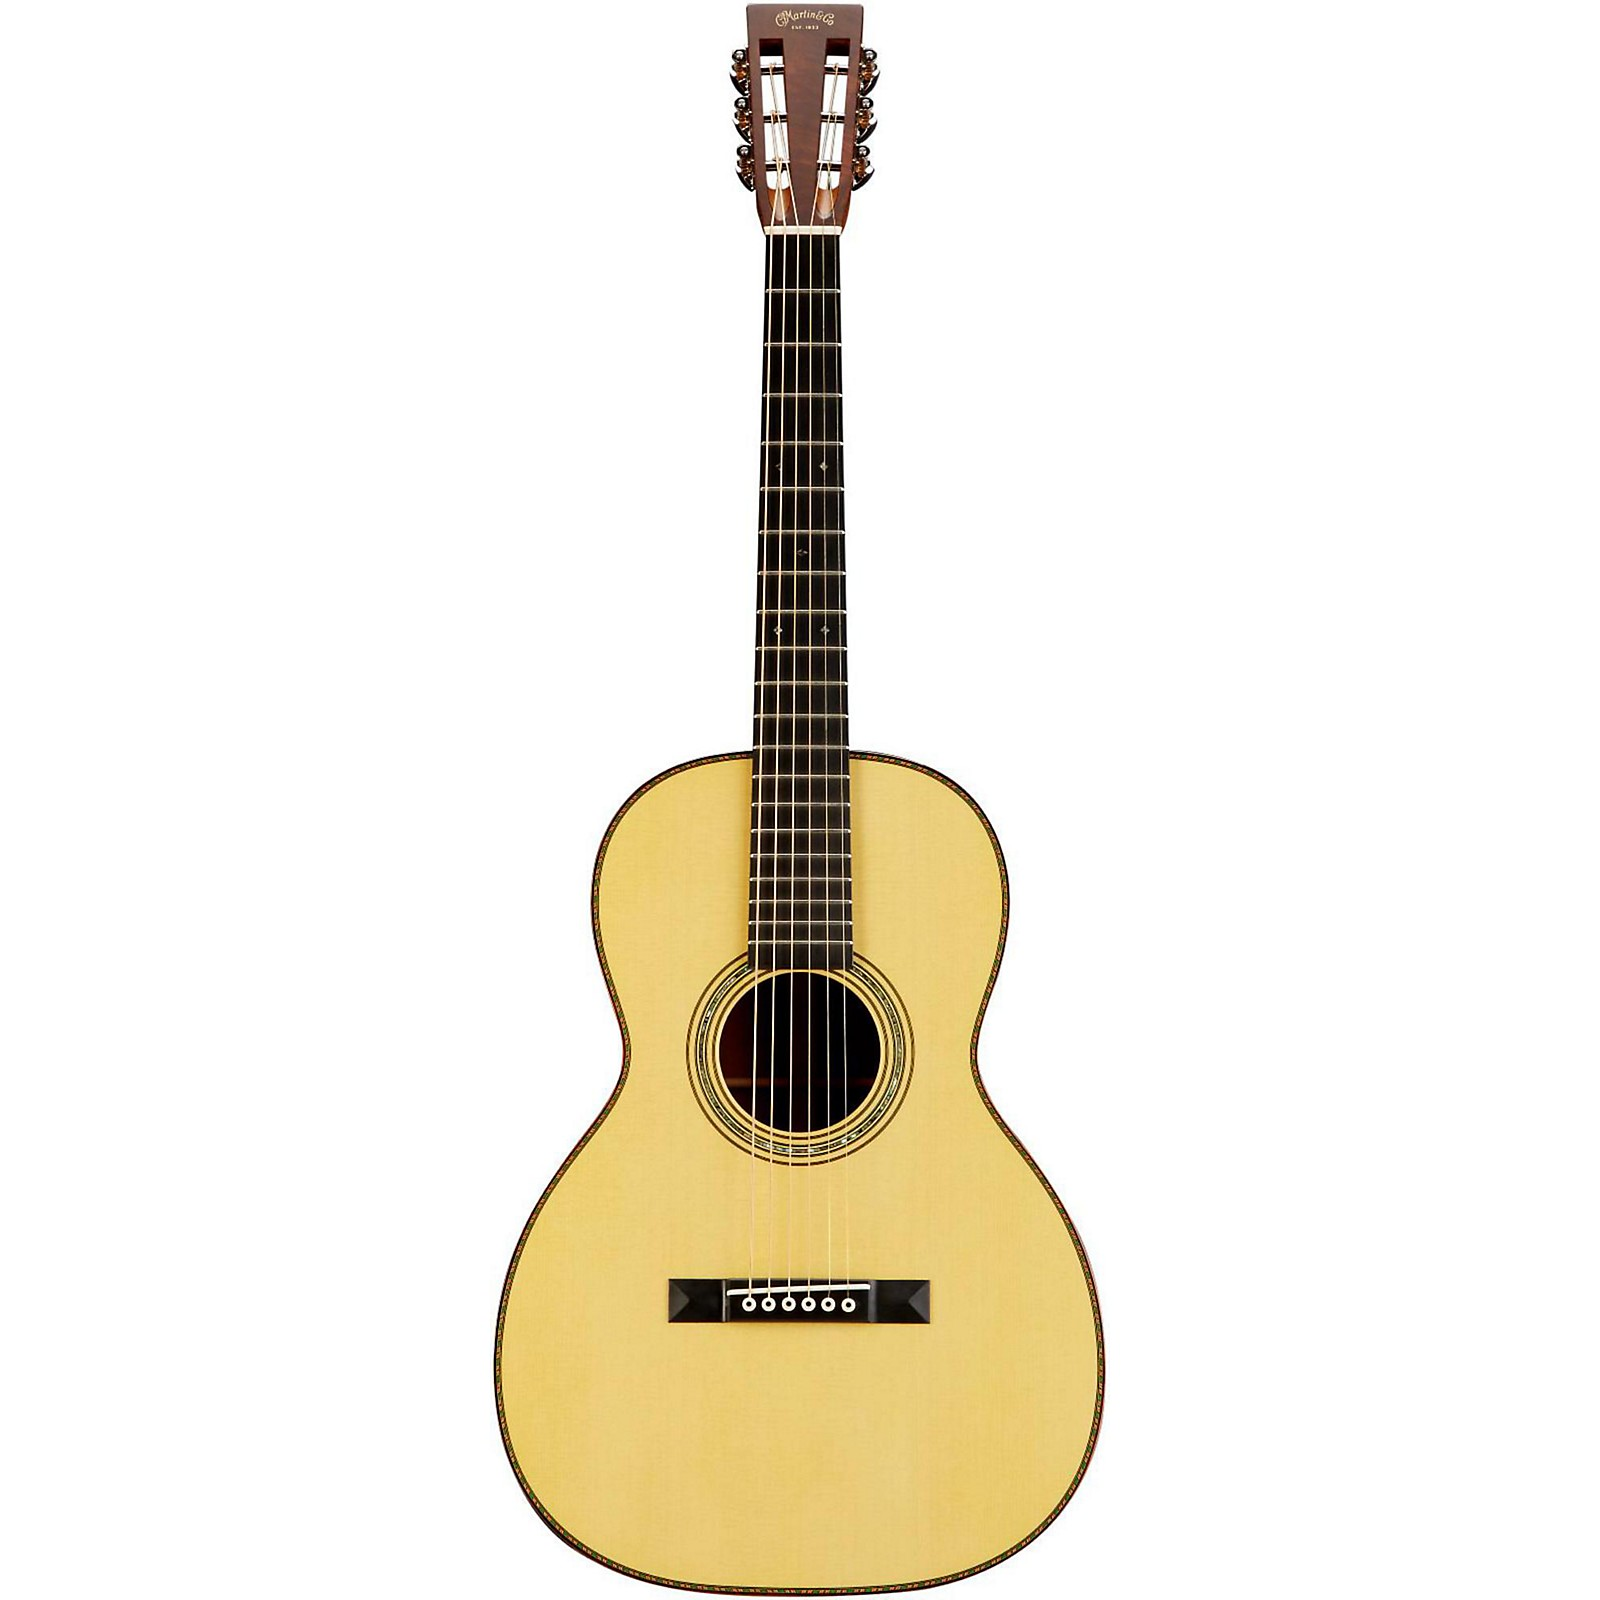 Martin Custom 00-12 Goncalo Alves Acoustic Guitar